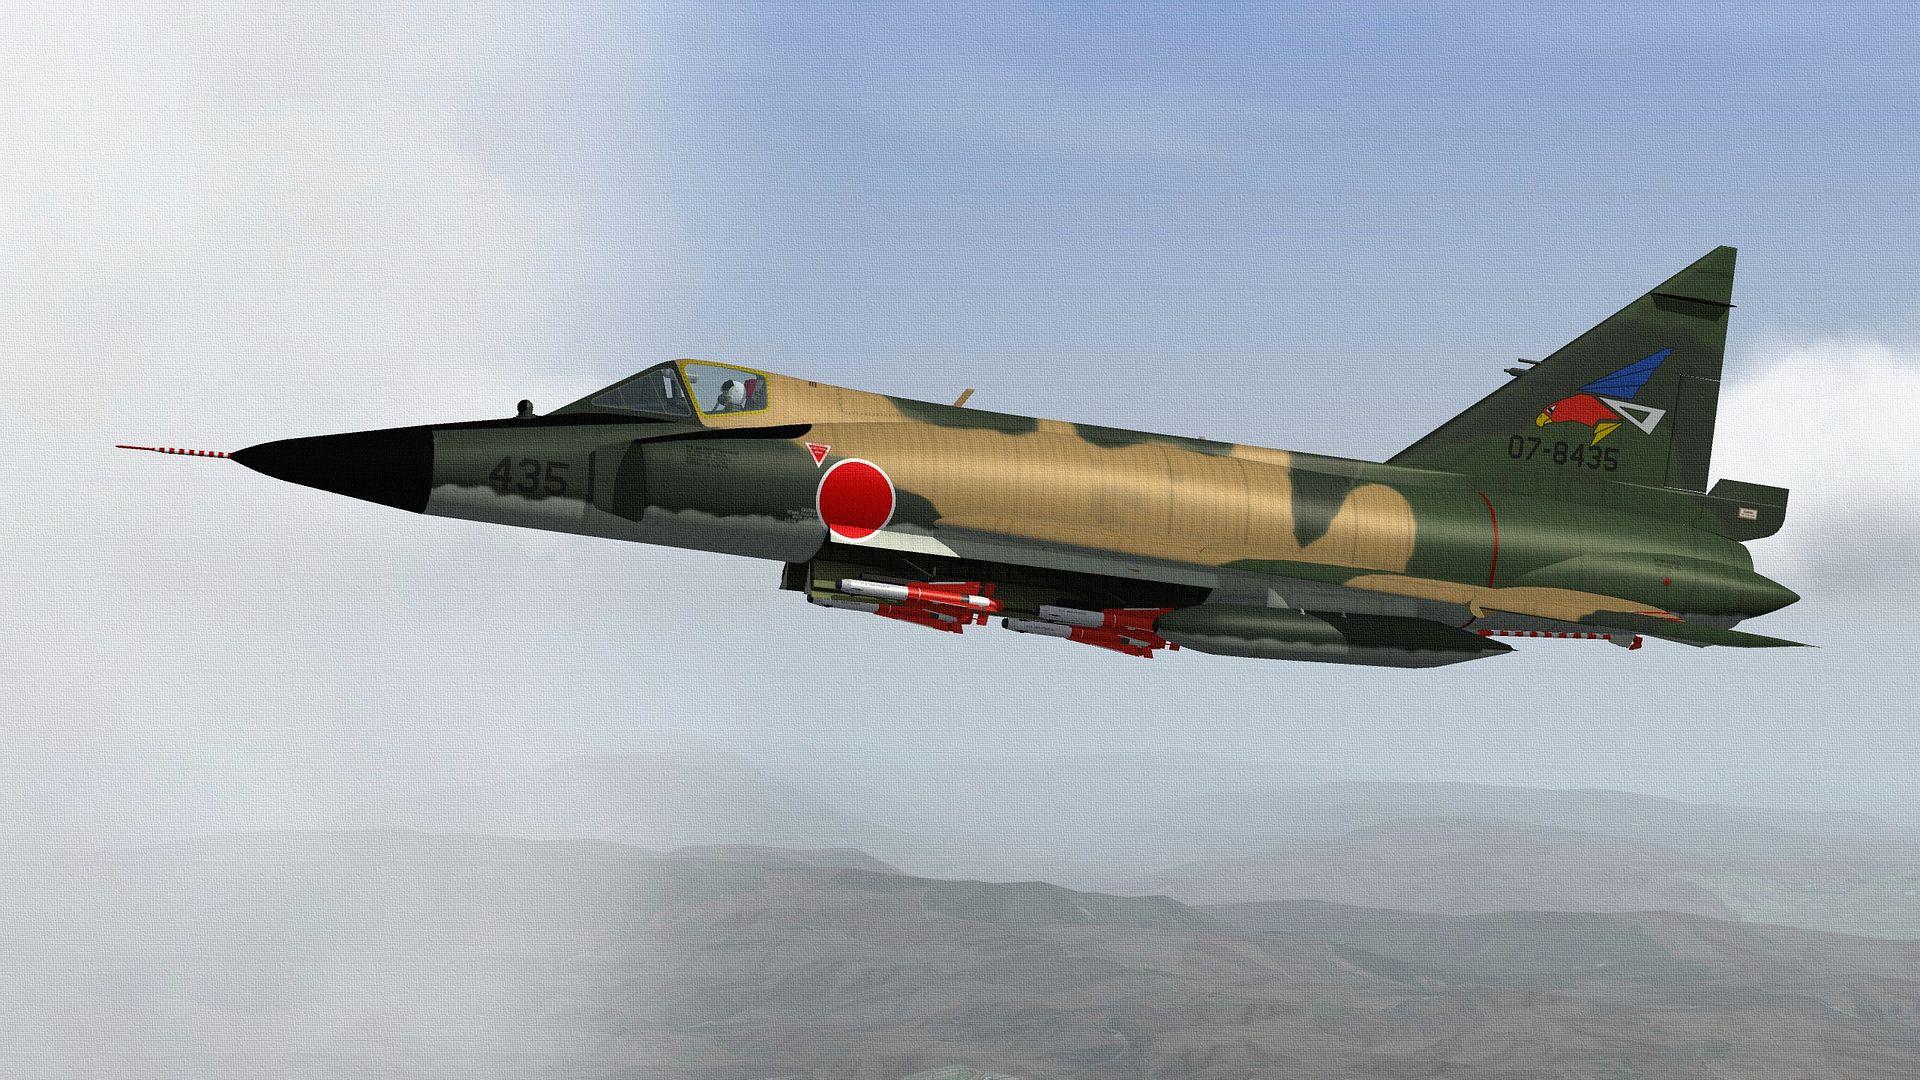 JASDF%20F-102A%20DELTA%20DAGGER.13_zpswp